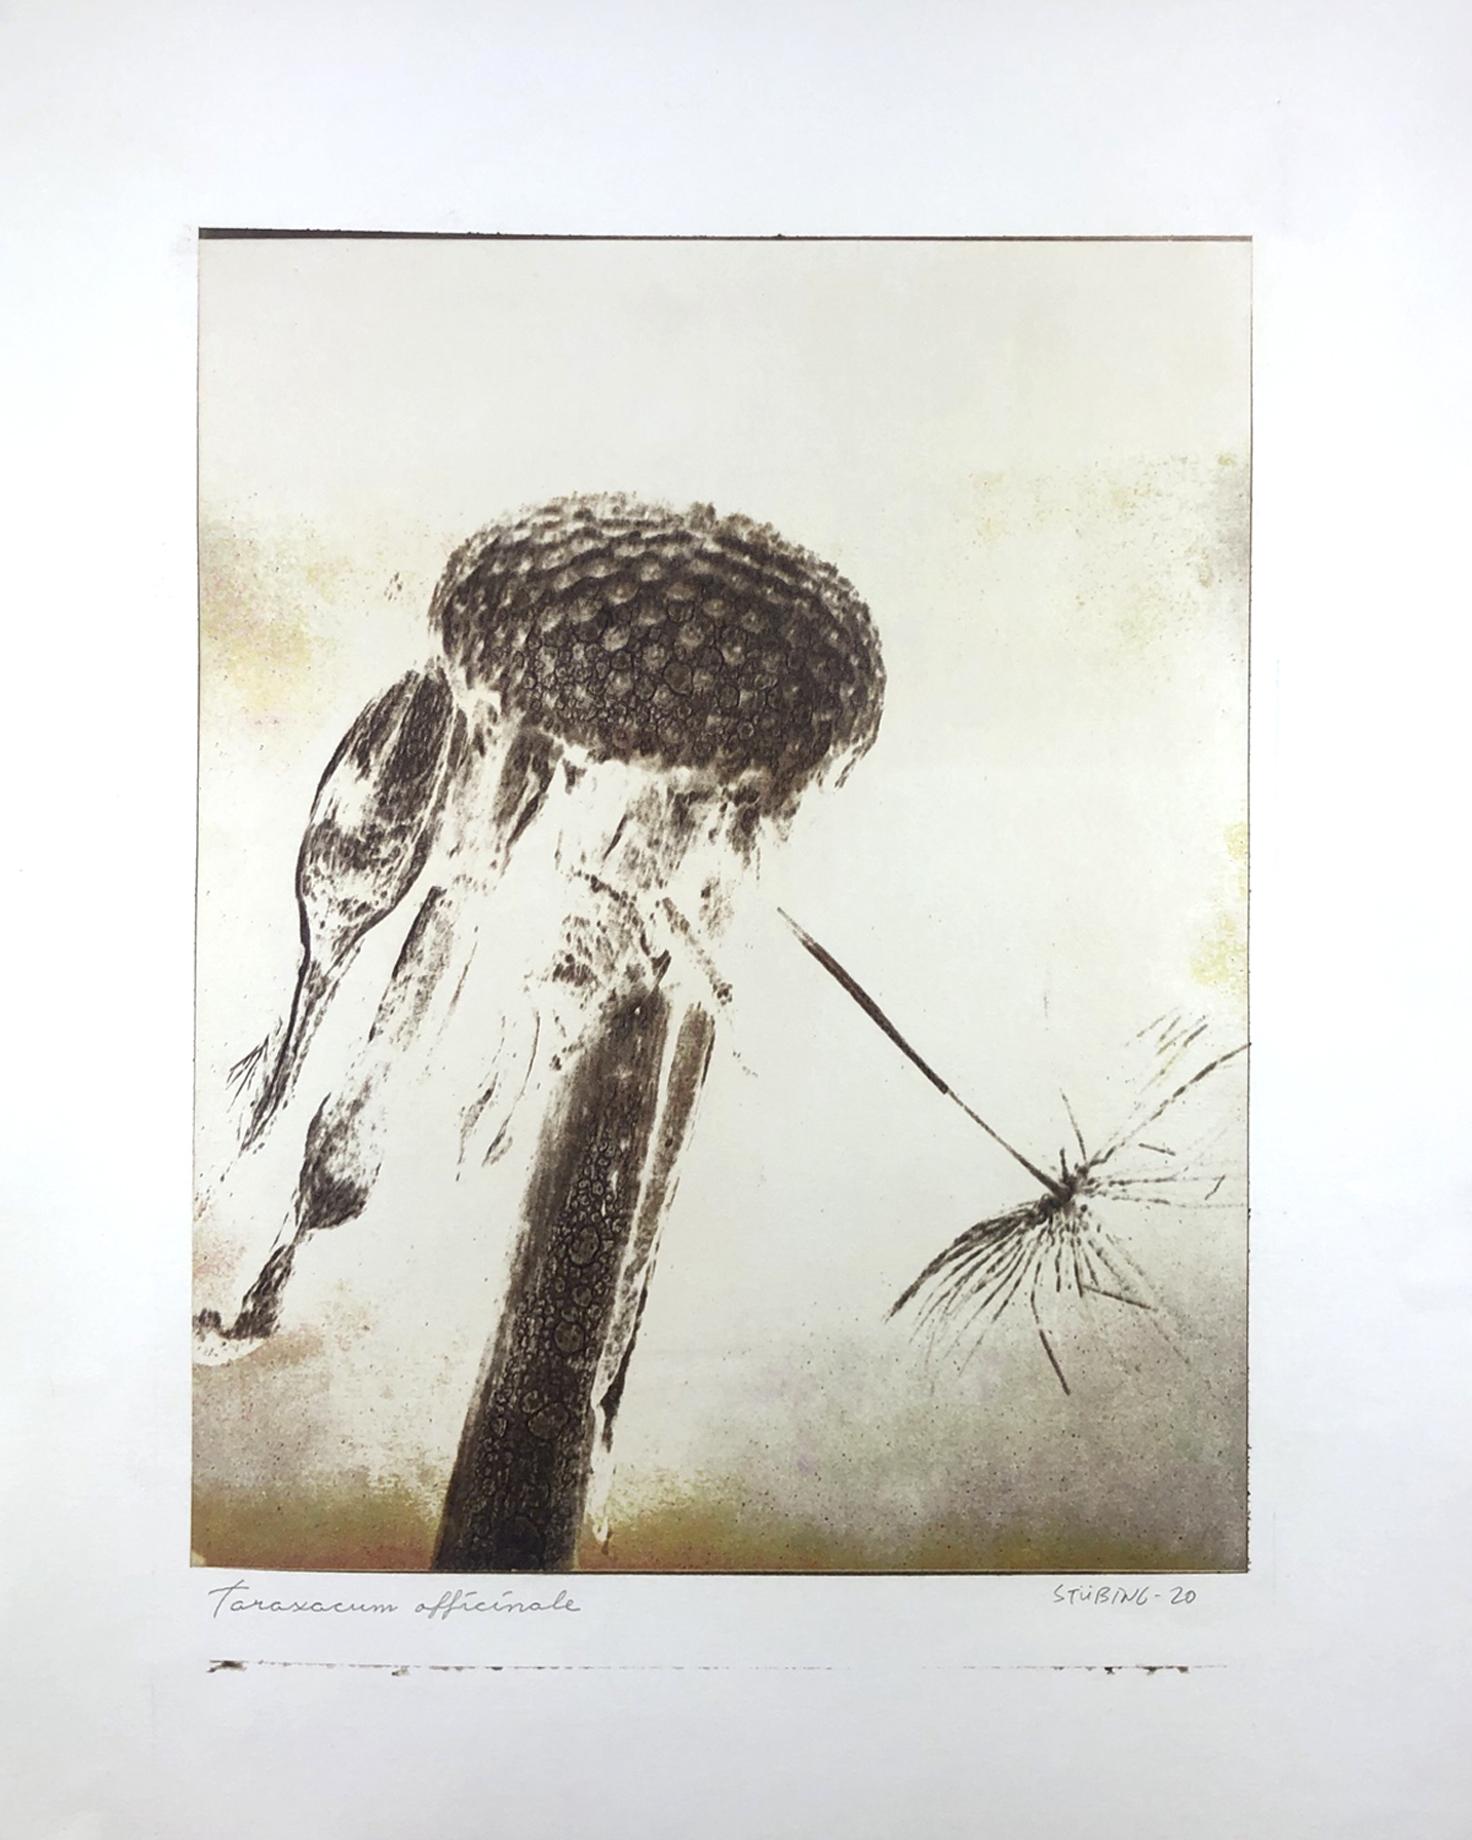 Taraxacum Officinale © Gerardo Stübing